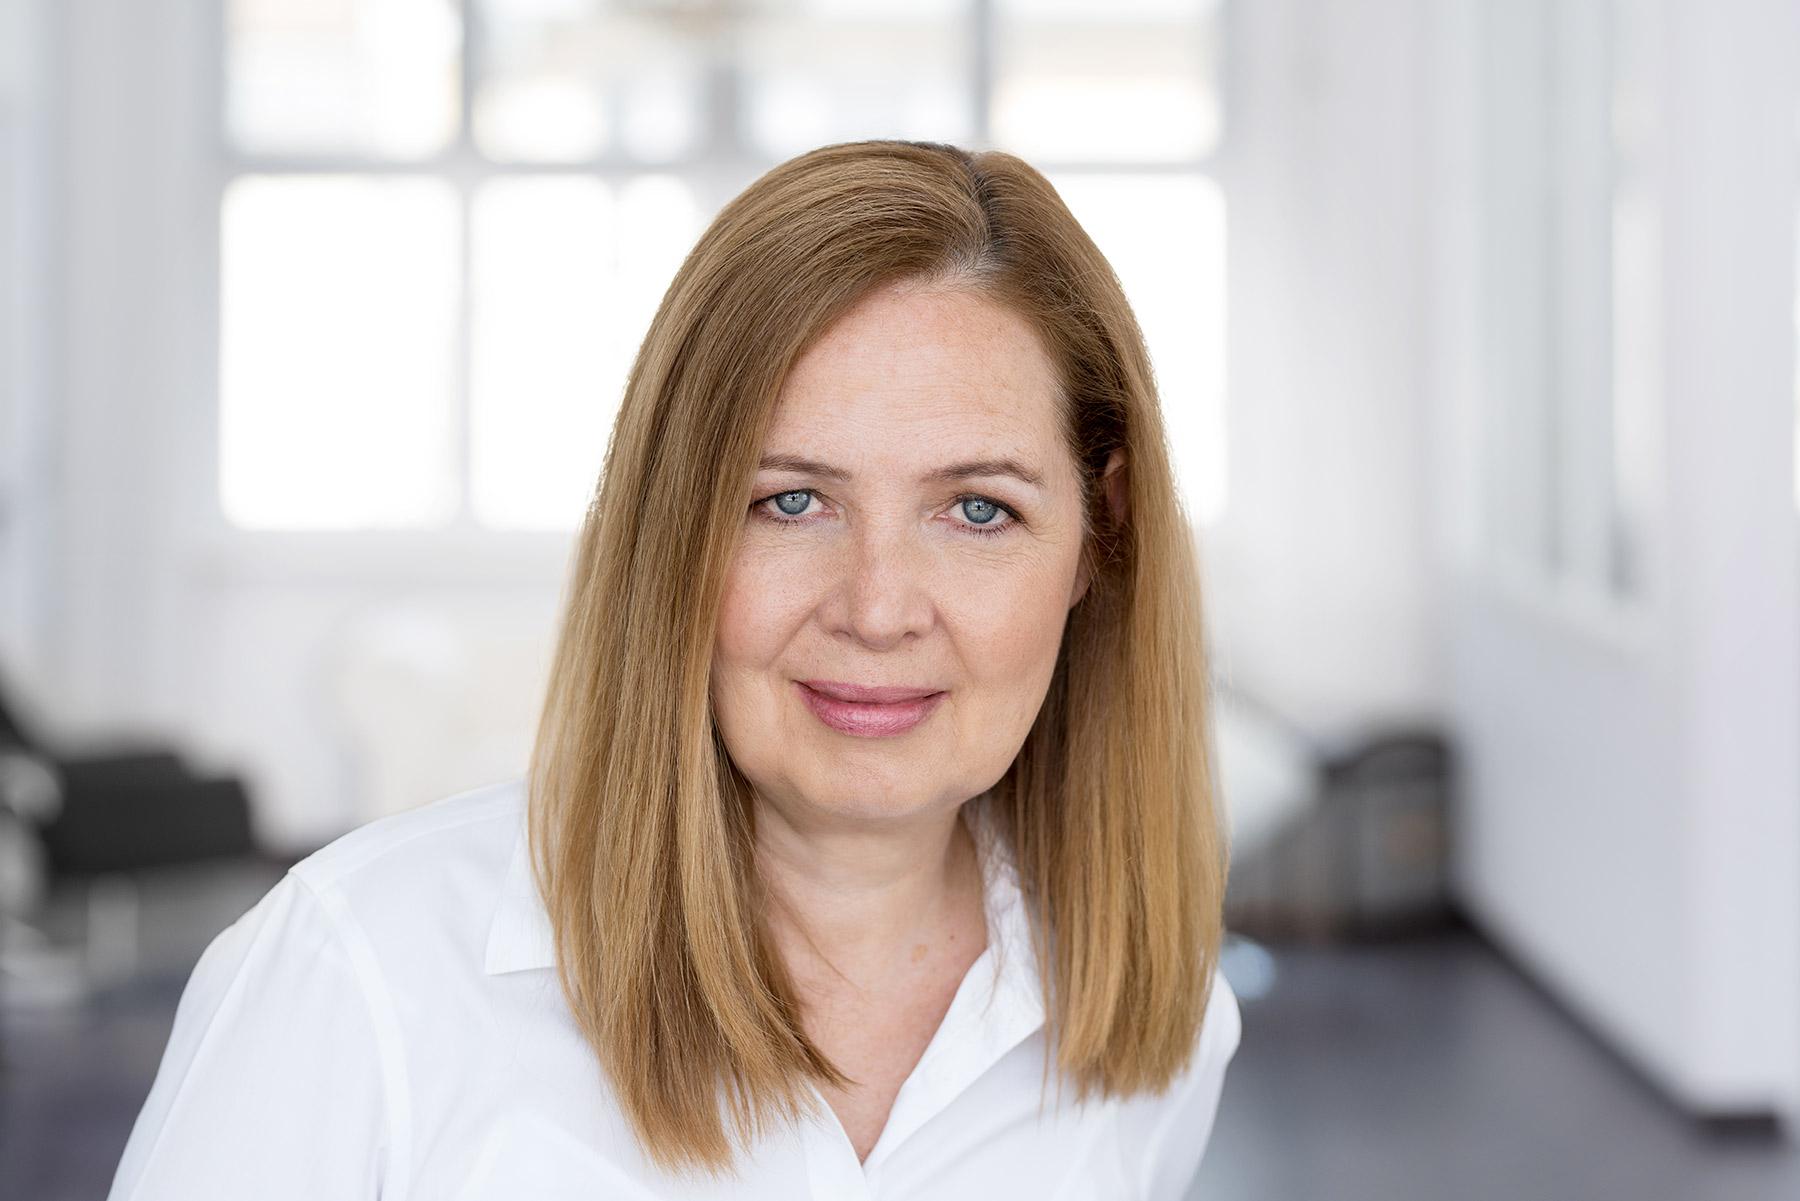 Portraitfotograf Berlin für Coaches, Facilitator und Berater